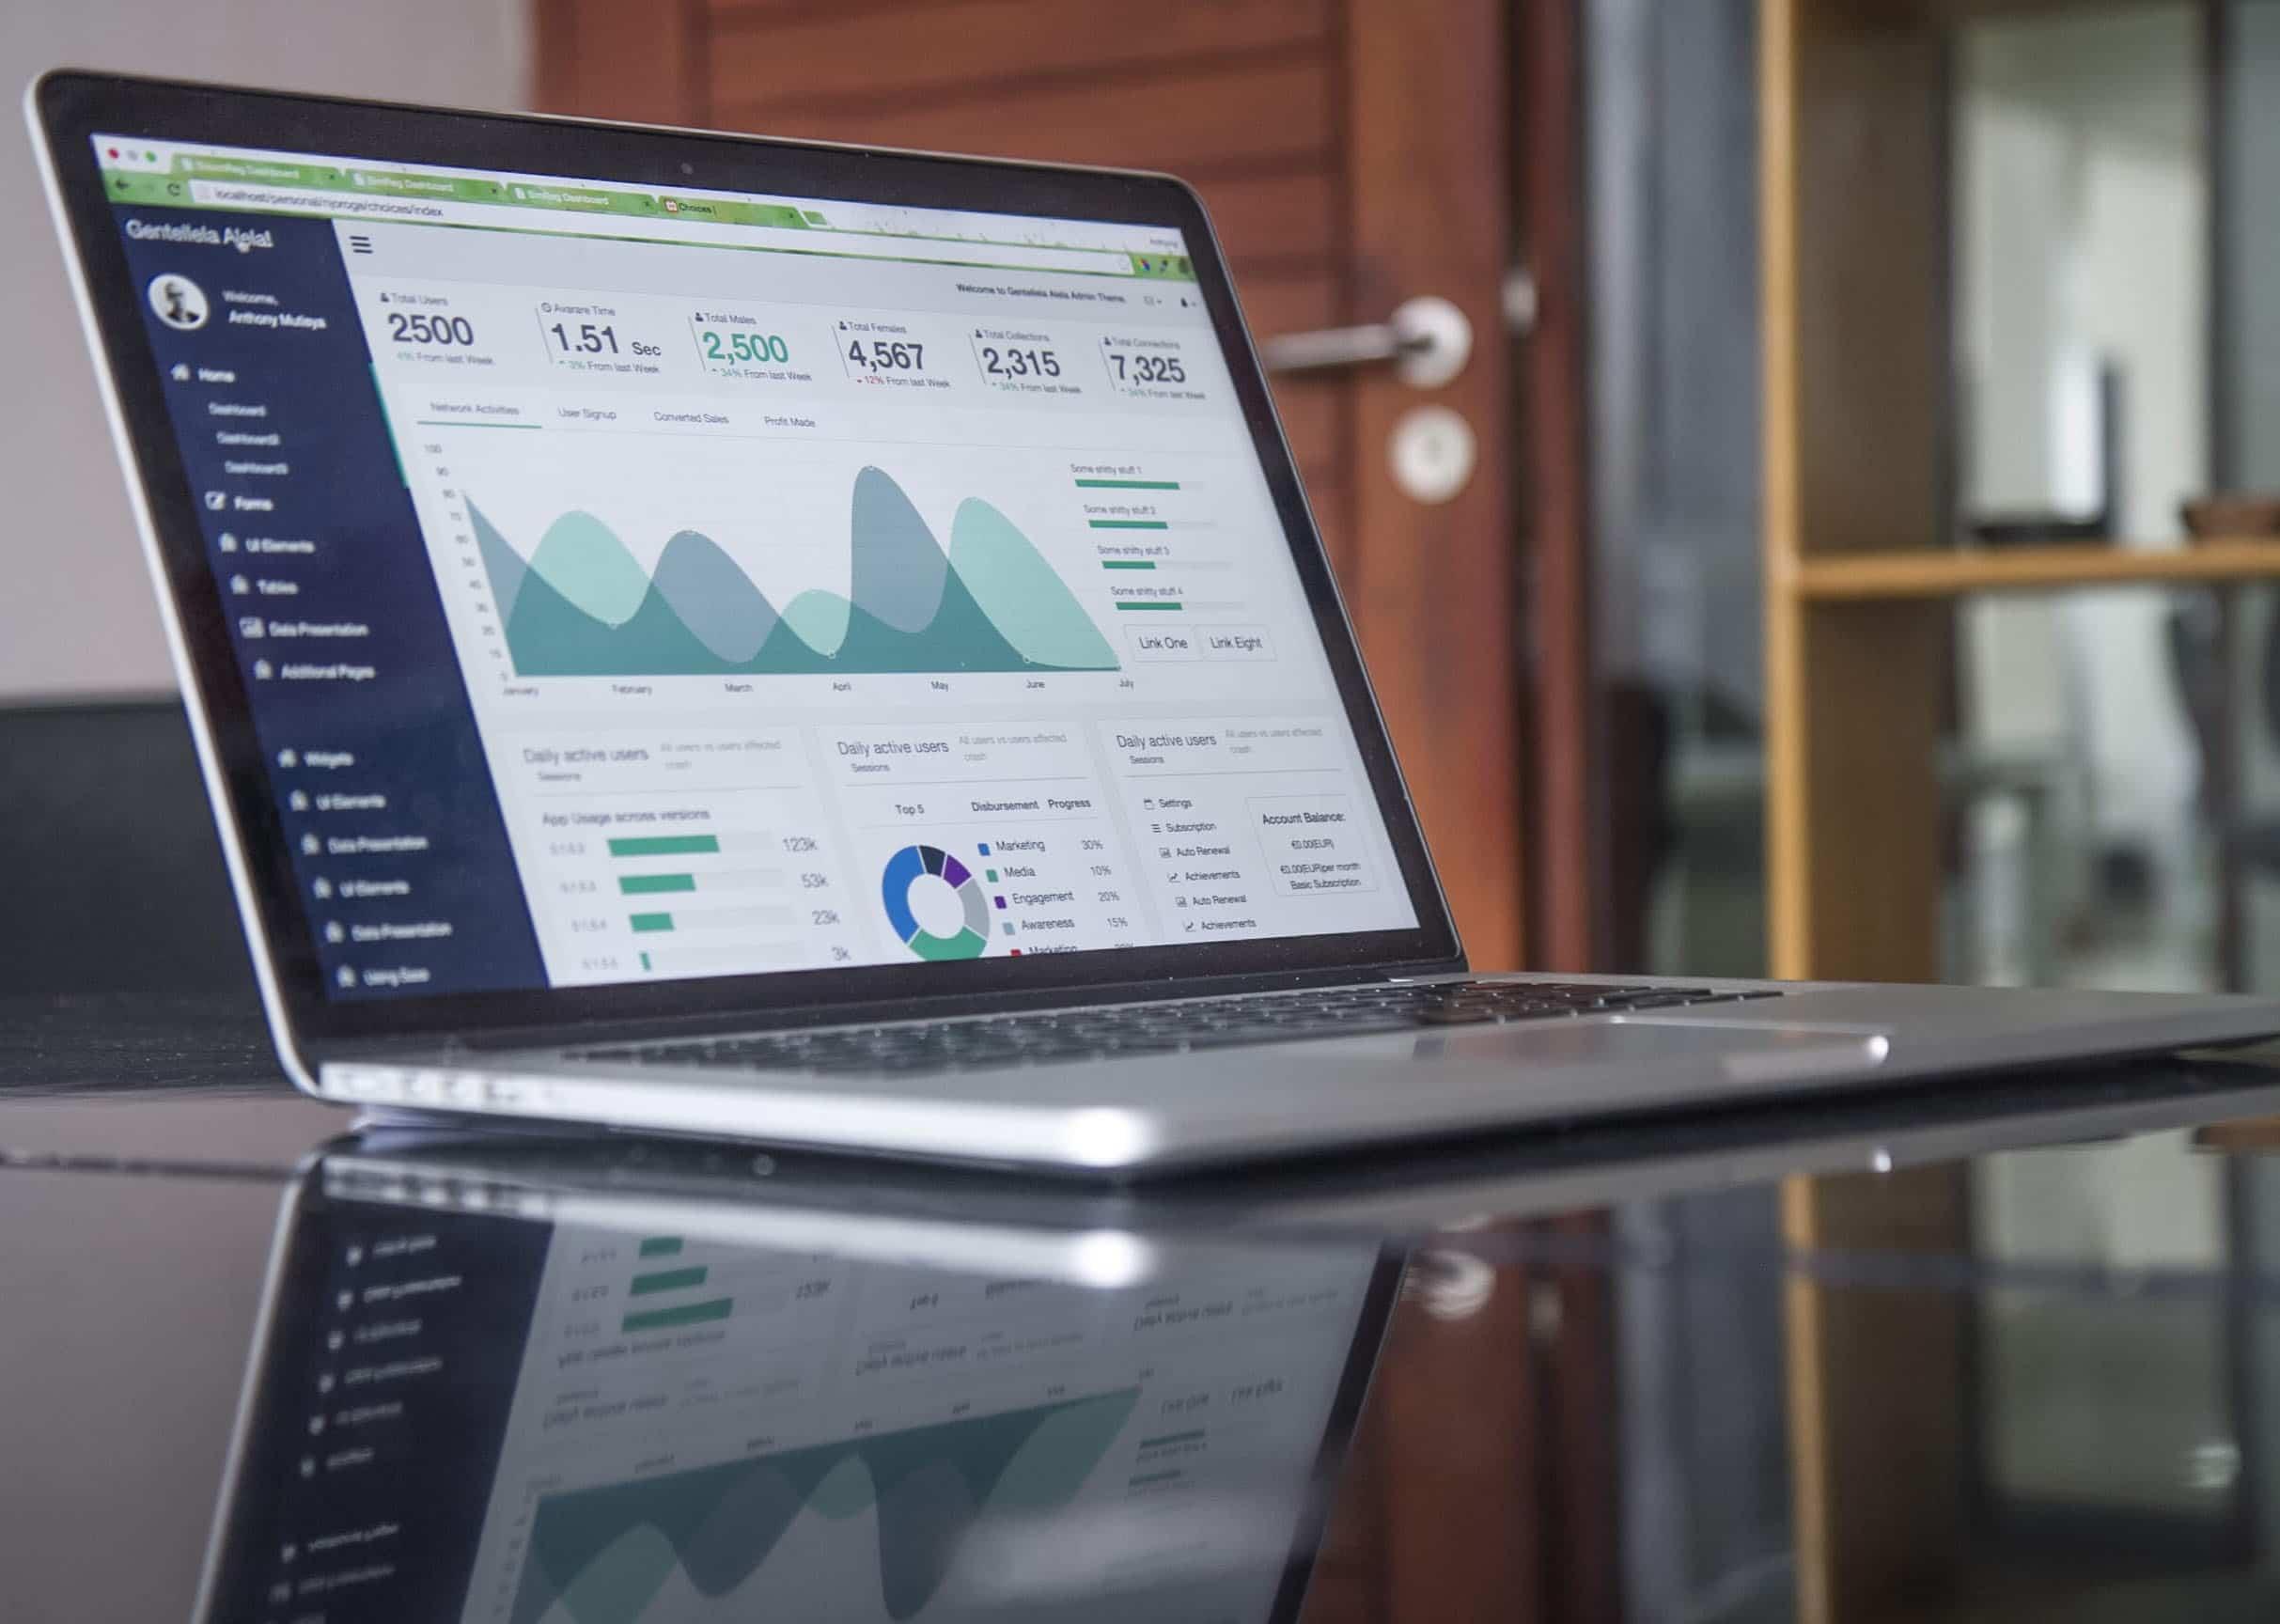 Laptop screen showing data report